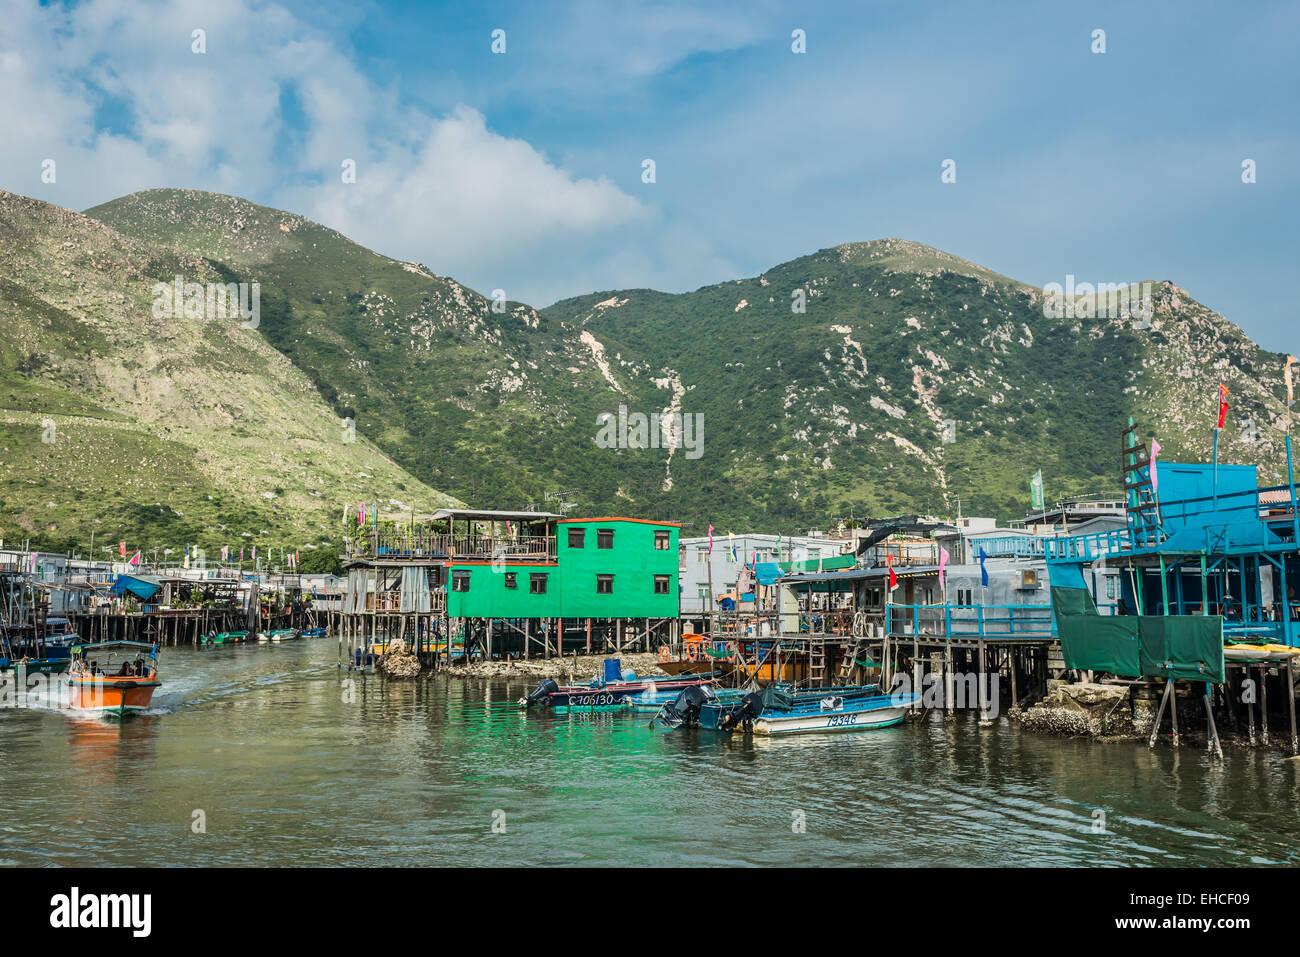 Tai O, Hong Kong, China- June 10, 2014: stilt houses and fishermen motorboats in Lantau island - Stock Image